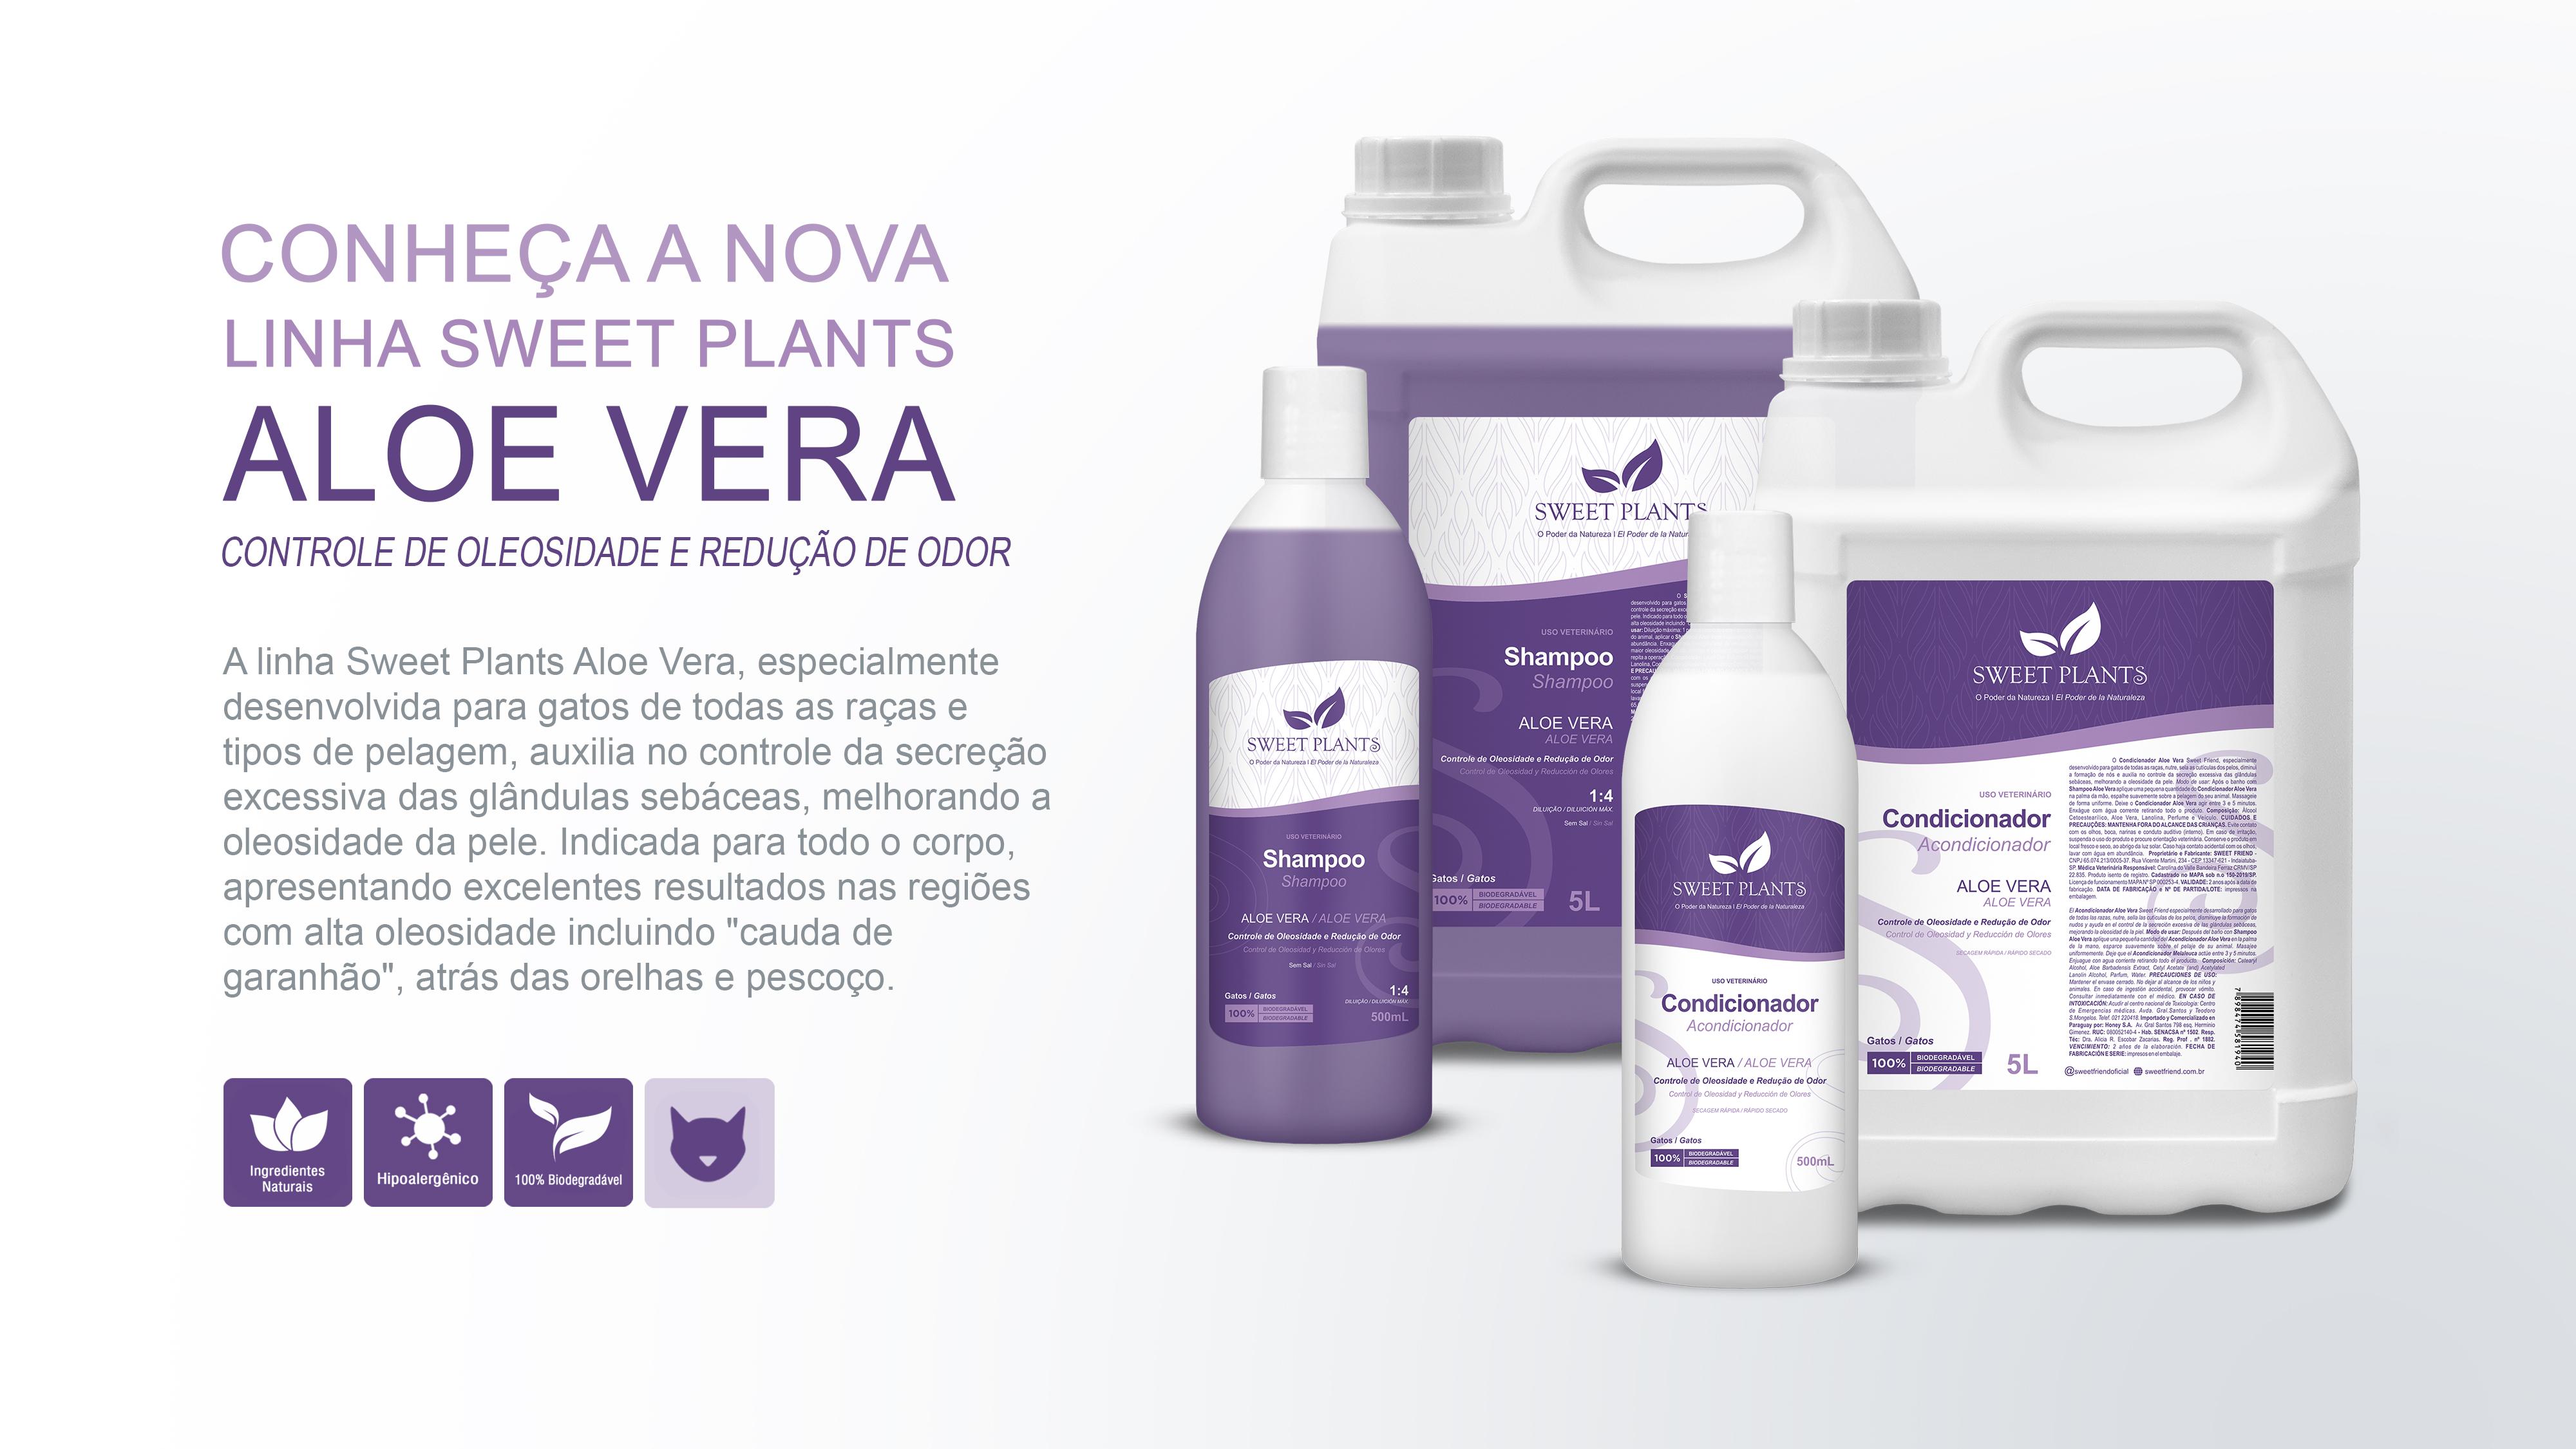 Sweet Friend - Linha Sweet Plants - Aloe Vera